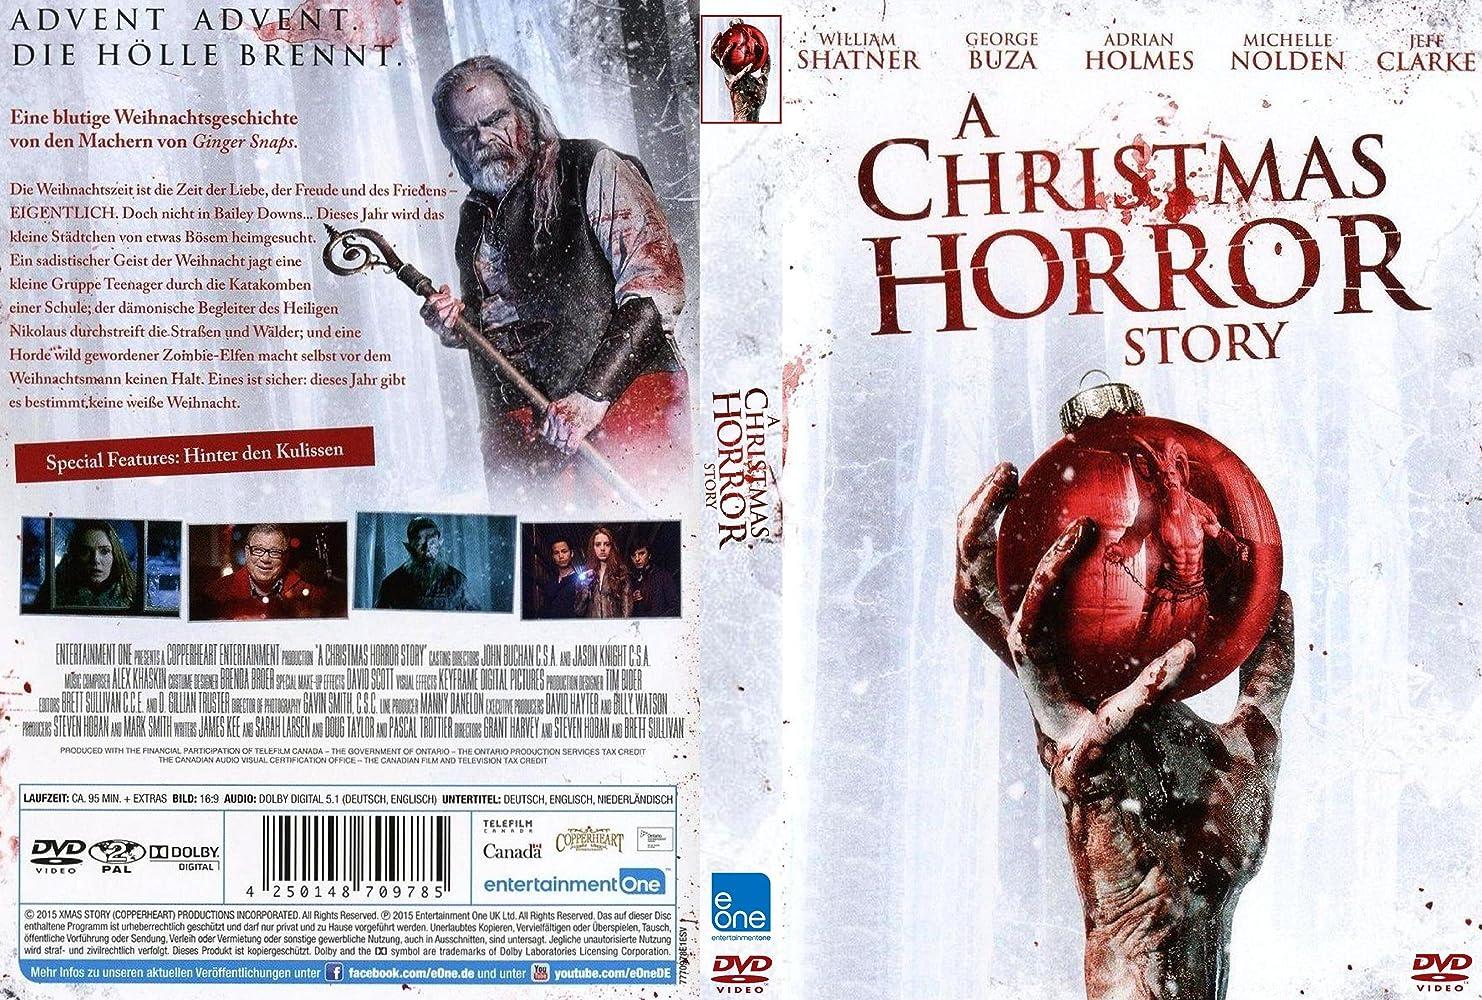 A Christmas Horror Story 2015.A Christmas Horror Story 2015